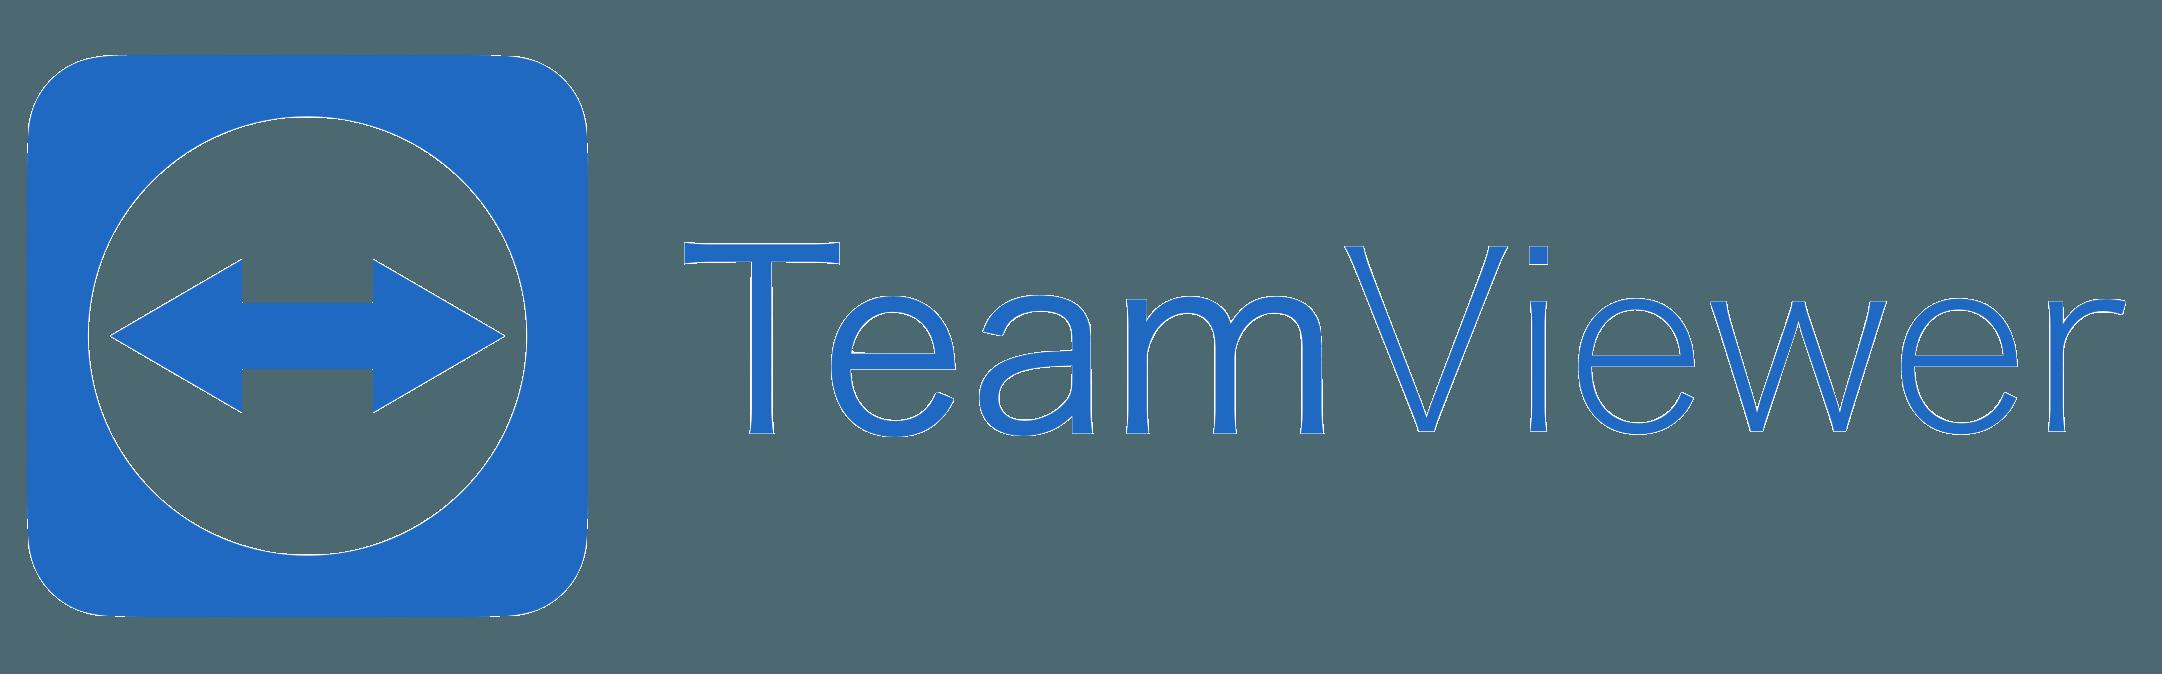 https://hypernovalabs.com/wp-content/uploads/2019/03/TeamViewer-logo.png